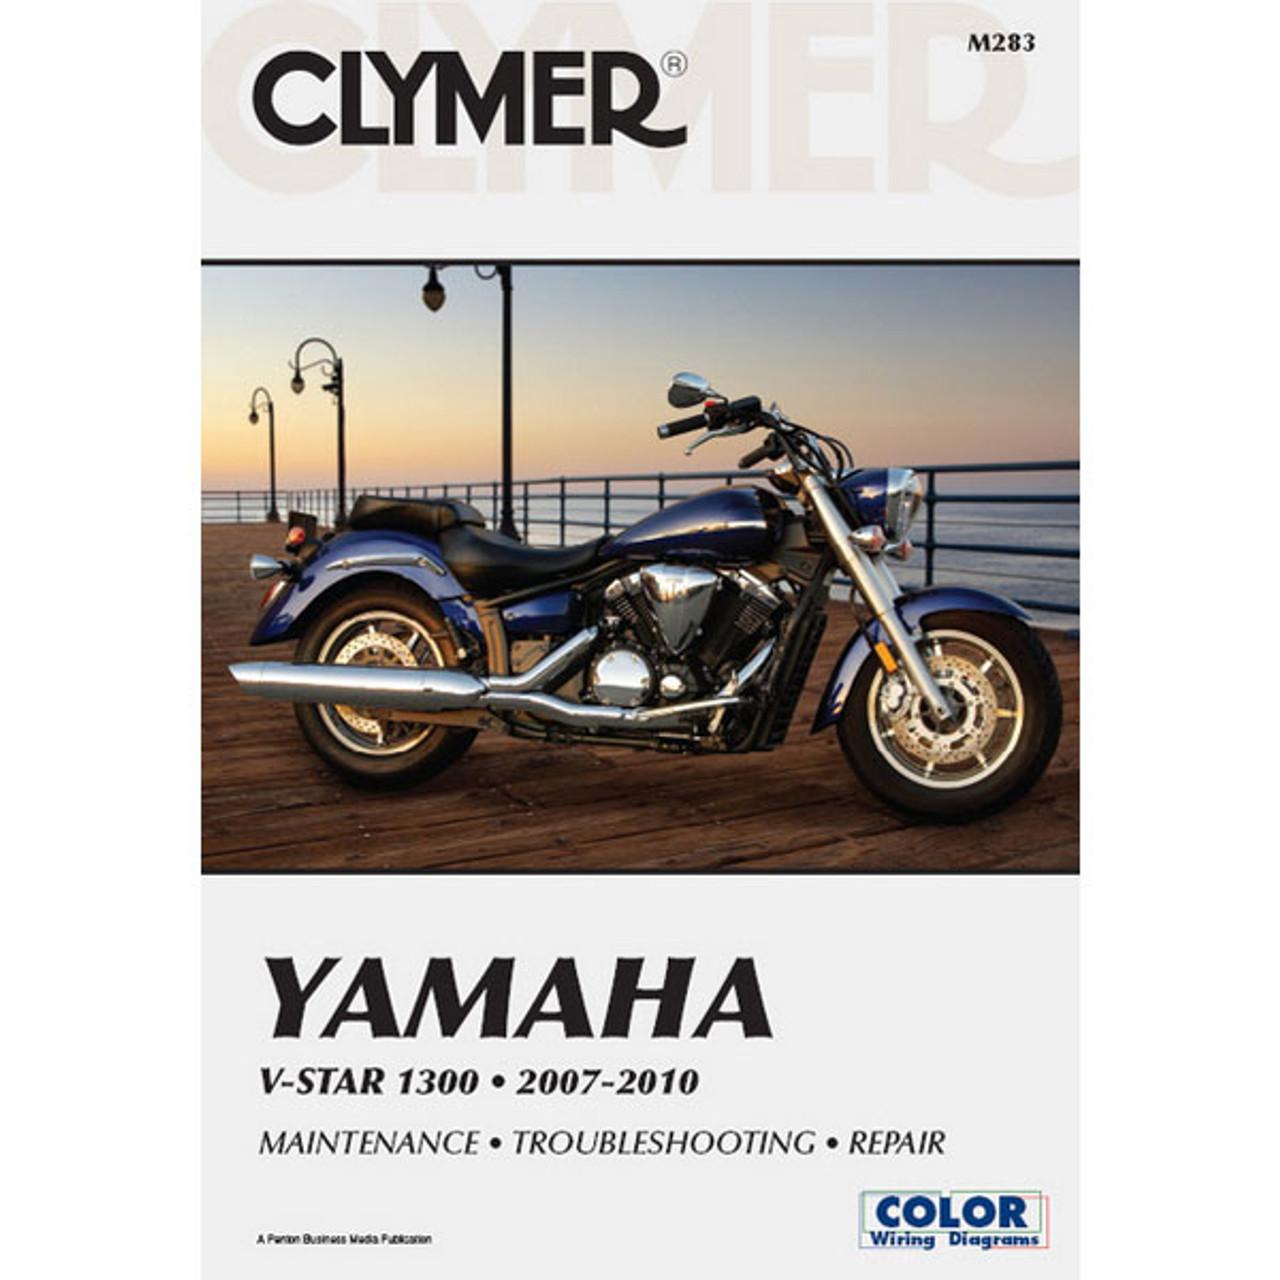 clymer yamaha v star 1300 07 10 service manual yamaha qt50 wiring-diagram yamaha 1300 wiring diagram #6